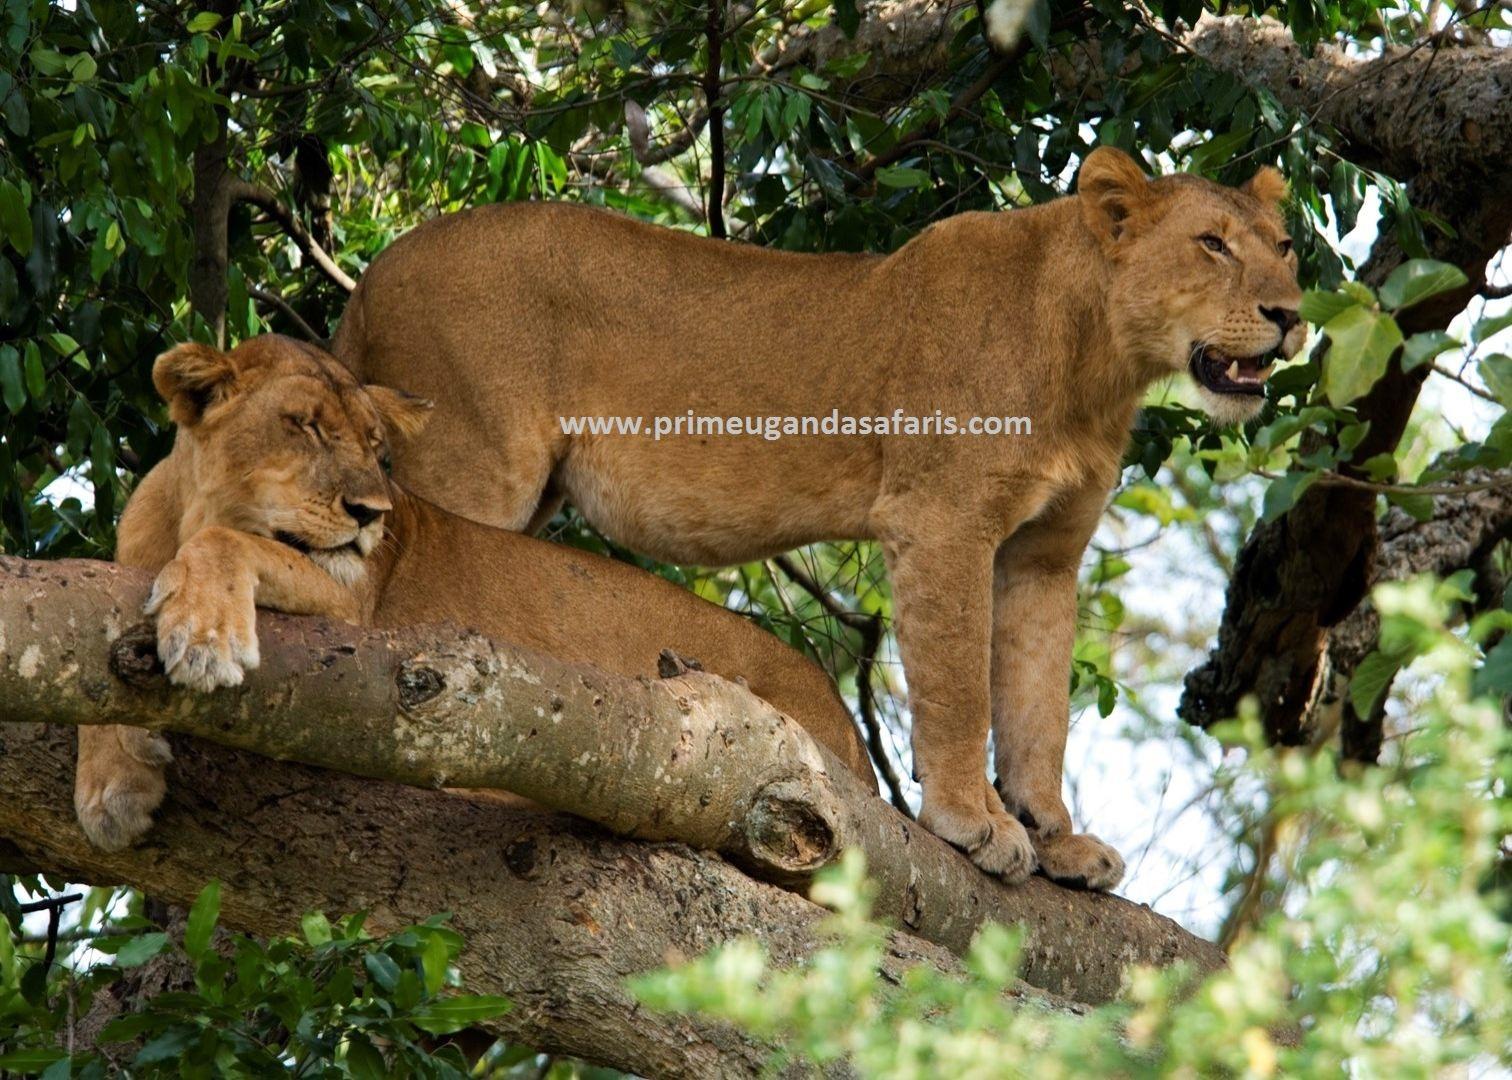 Tree climbing lions at Queen Elizabeth National Park seen on a Uganda safari